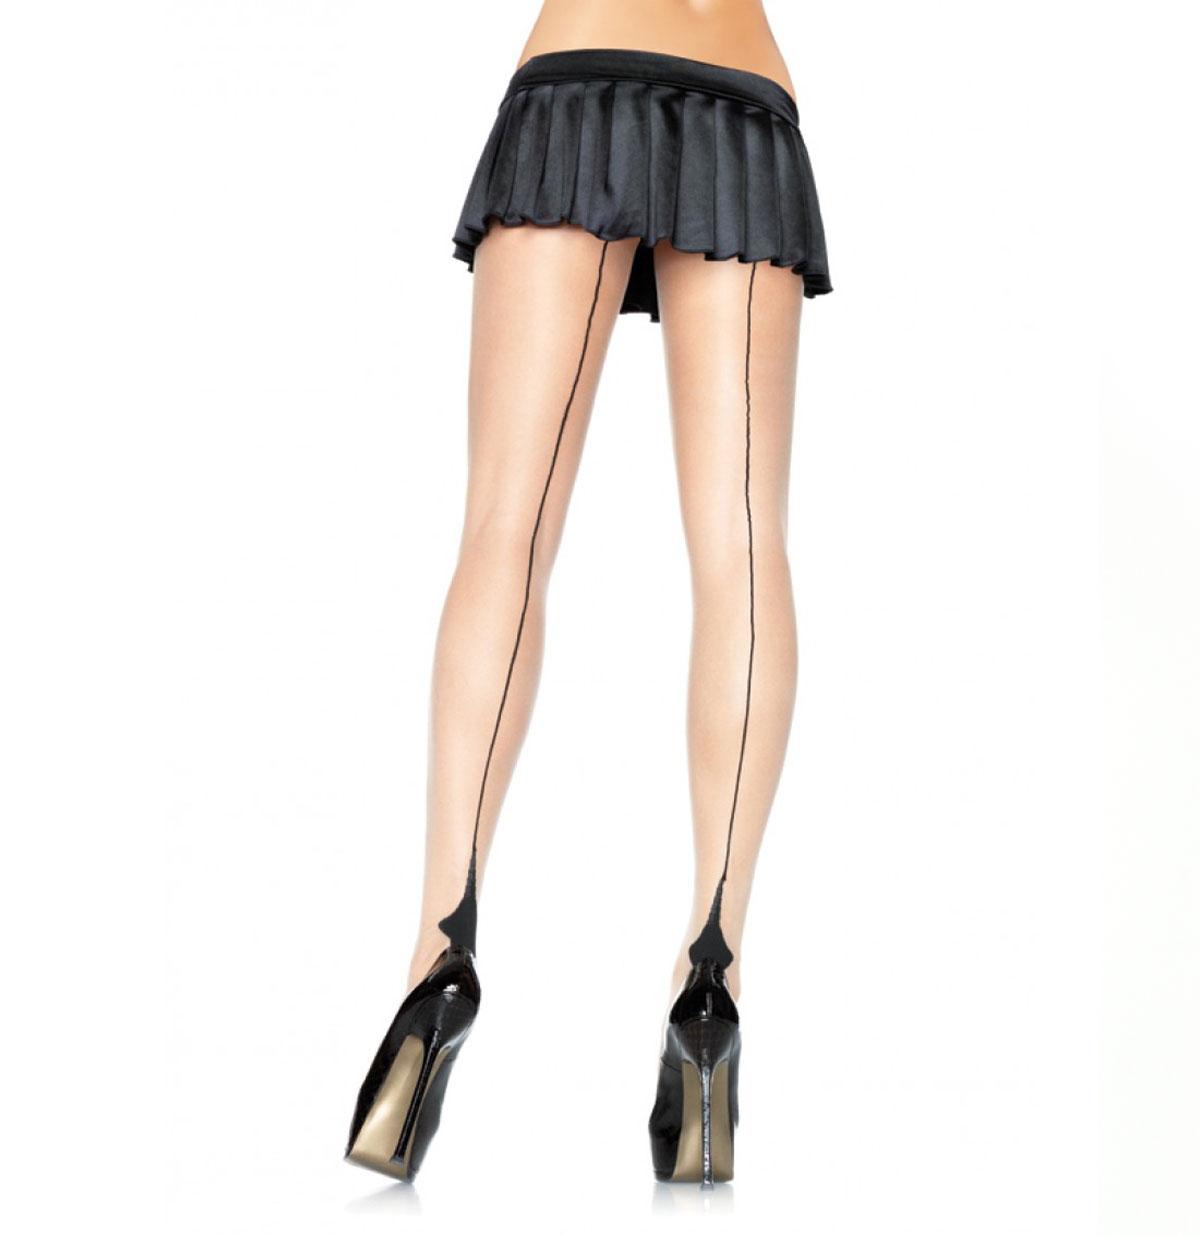 Cuban Heel Panty Nude/Black